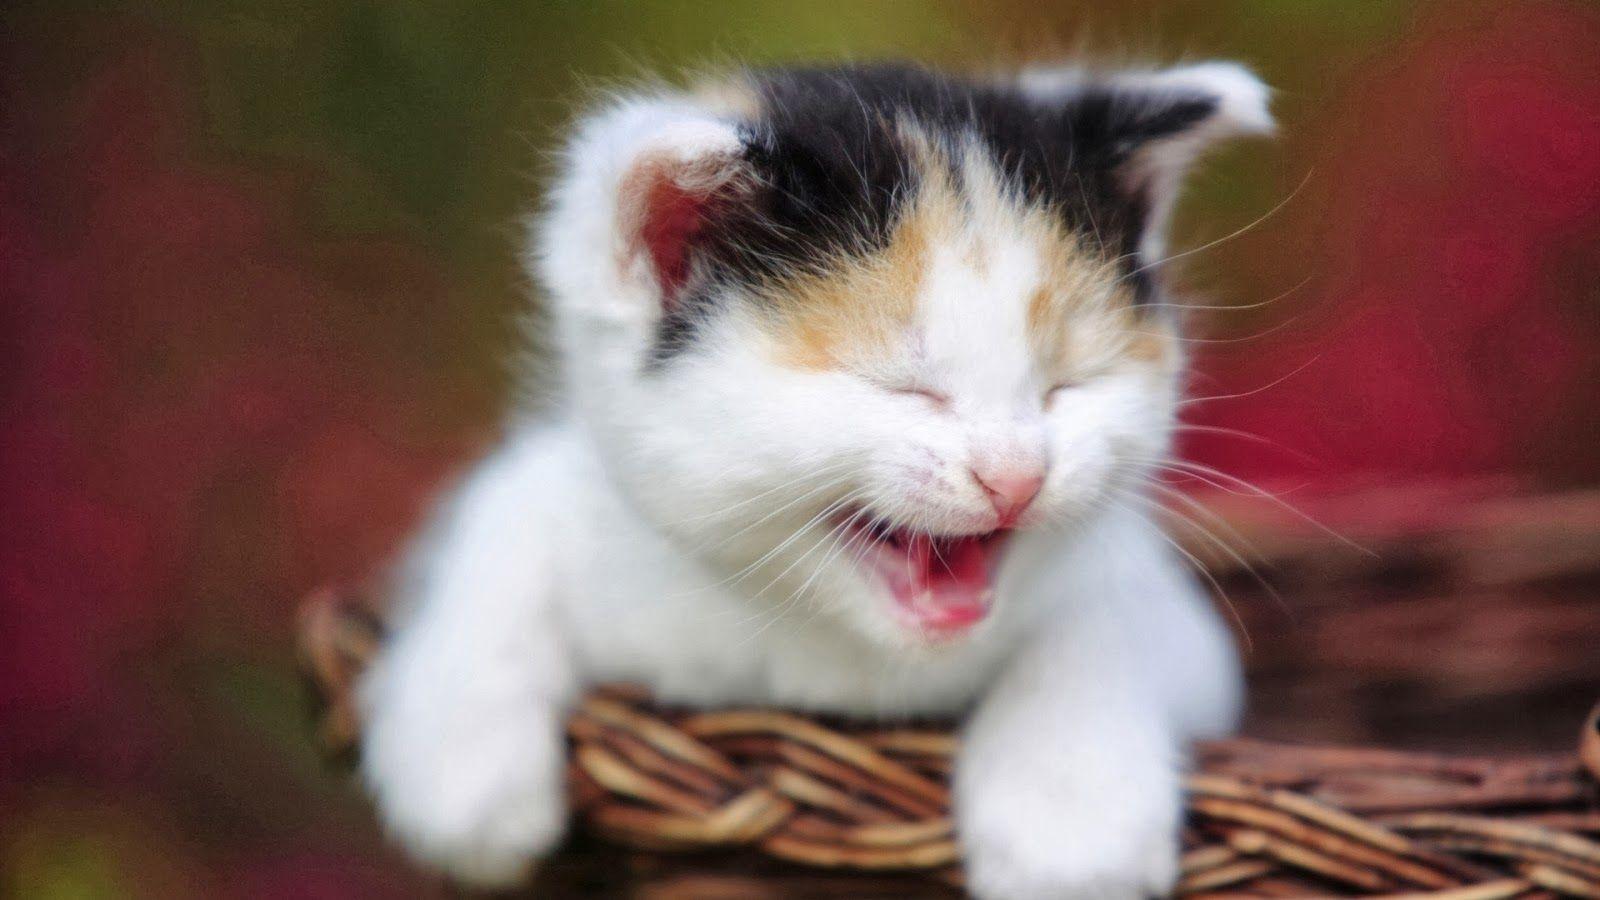 Anak Kucing Kucing Lucu Kucing Imut Kucing pintar Kucing